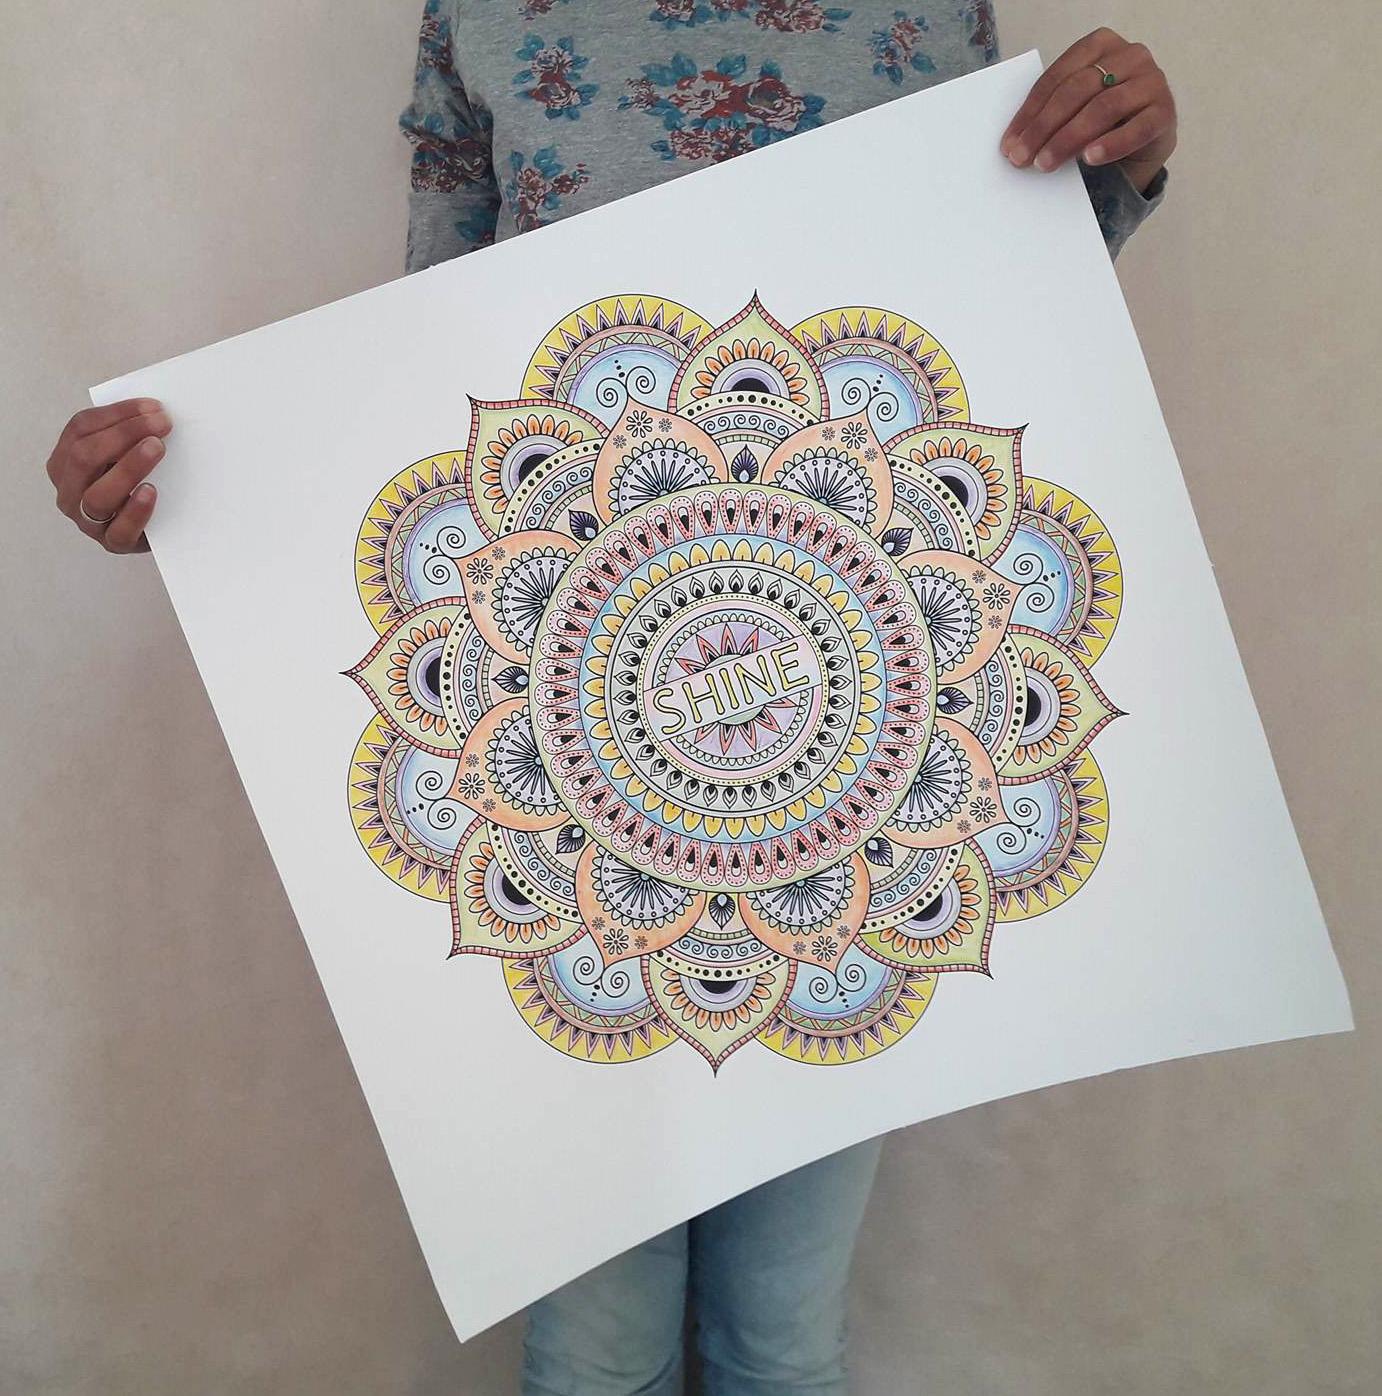 Rachelsfinelines $ 2290 Usd Mandala Poster Home Decor Do It